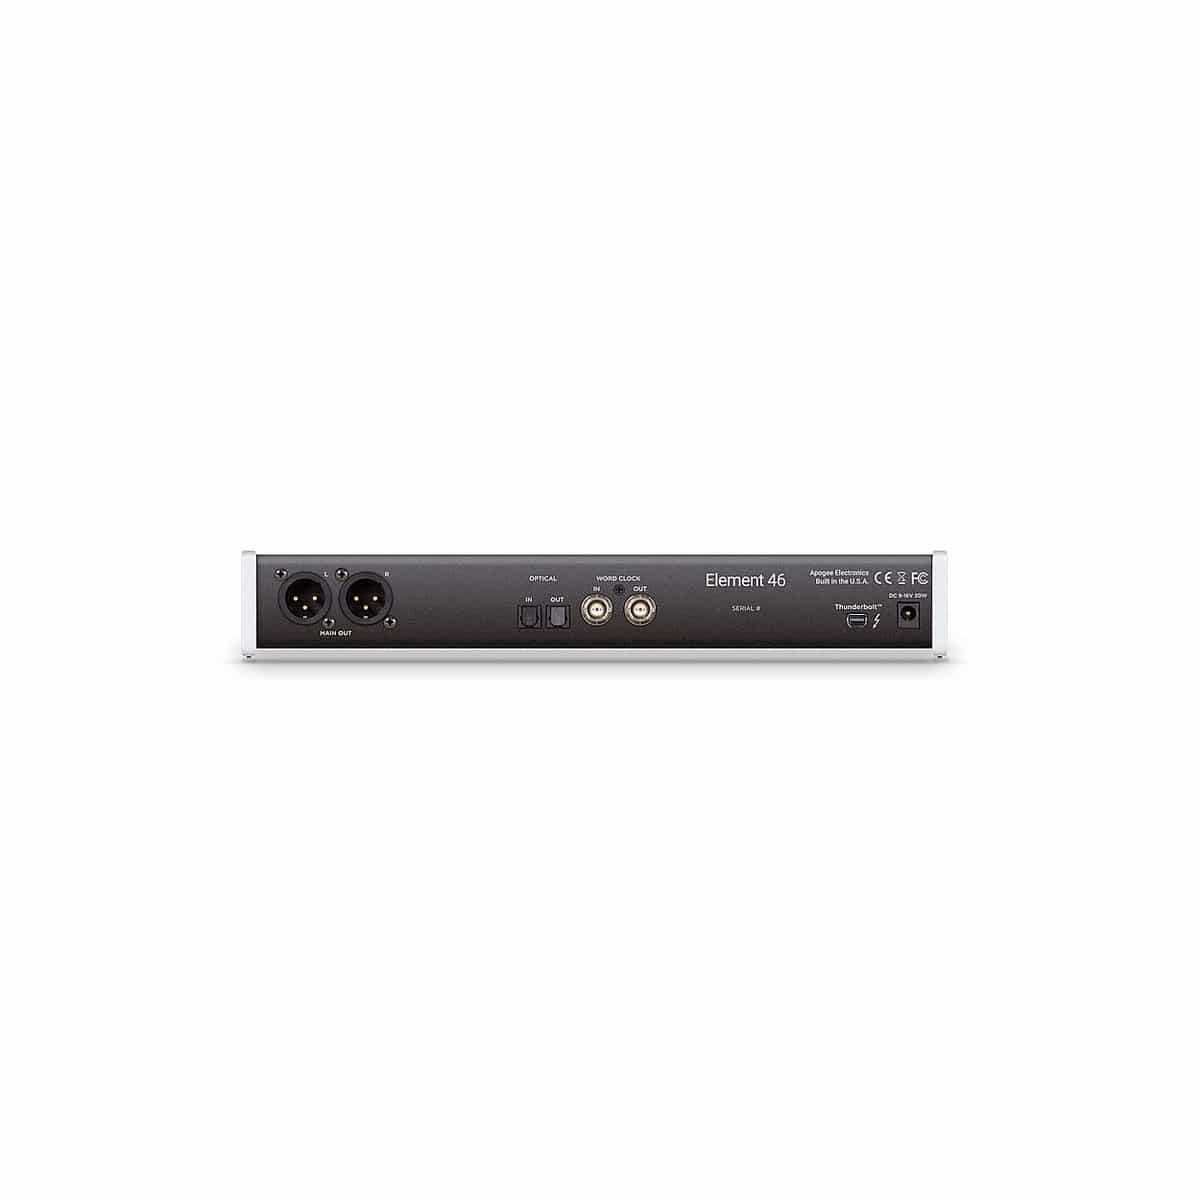 Apogee ELEMENT 46 Pro Audio, Audio Digitale, Schede Audio per PC e MAC Apogee Element 46 03